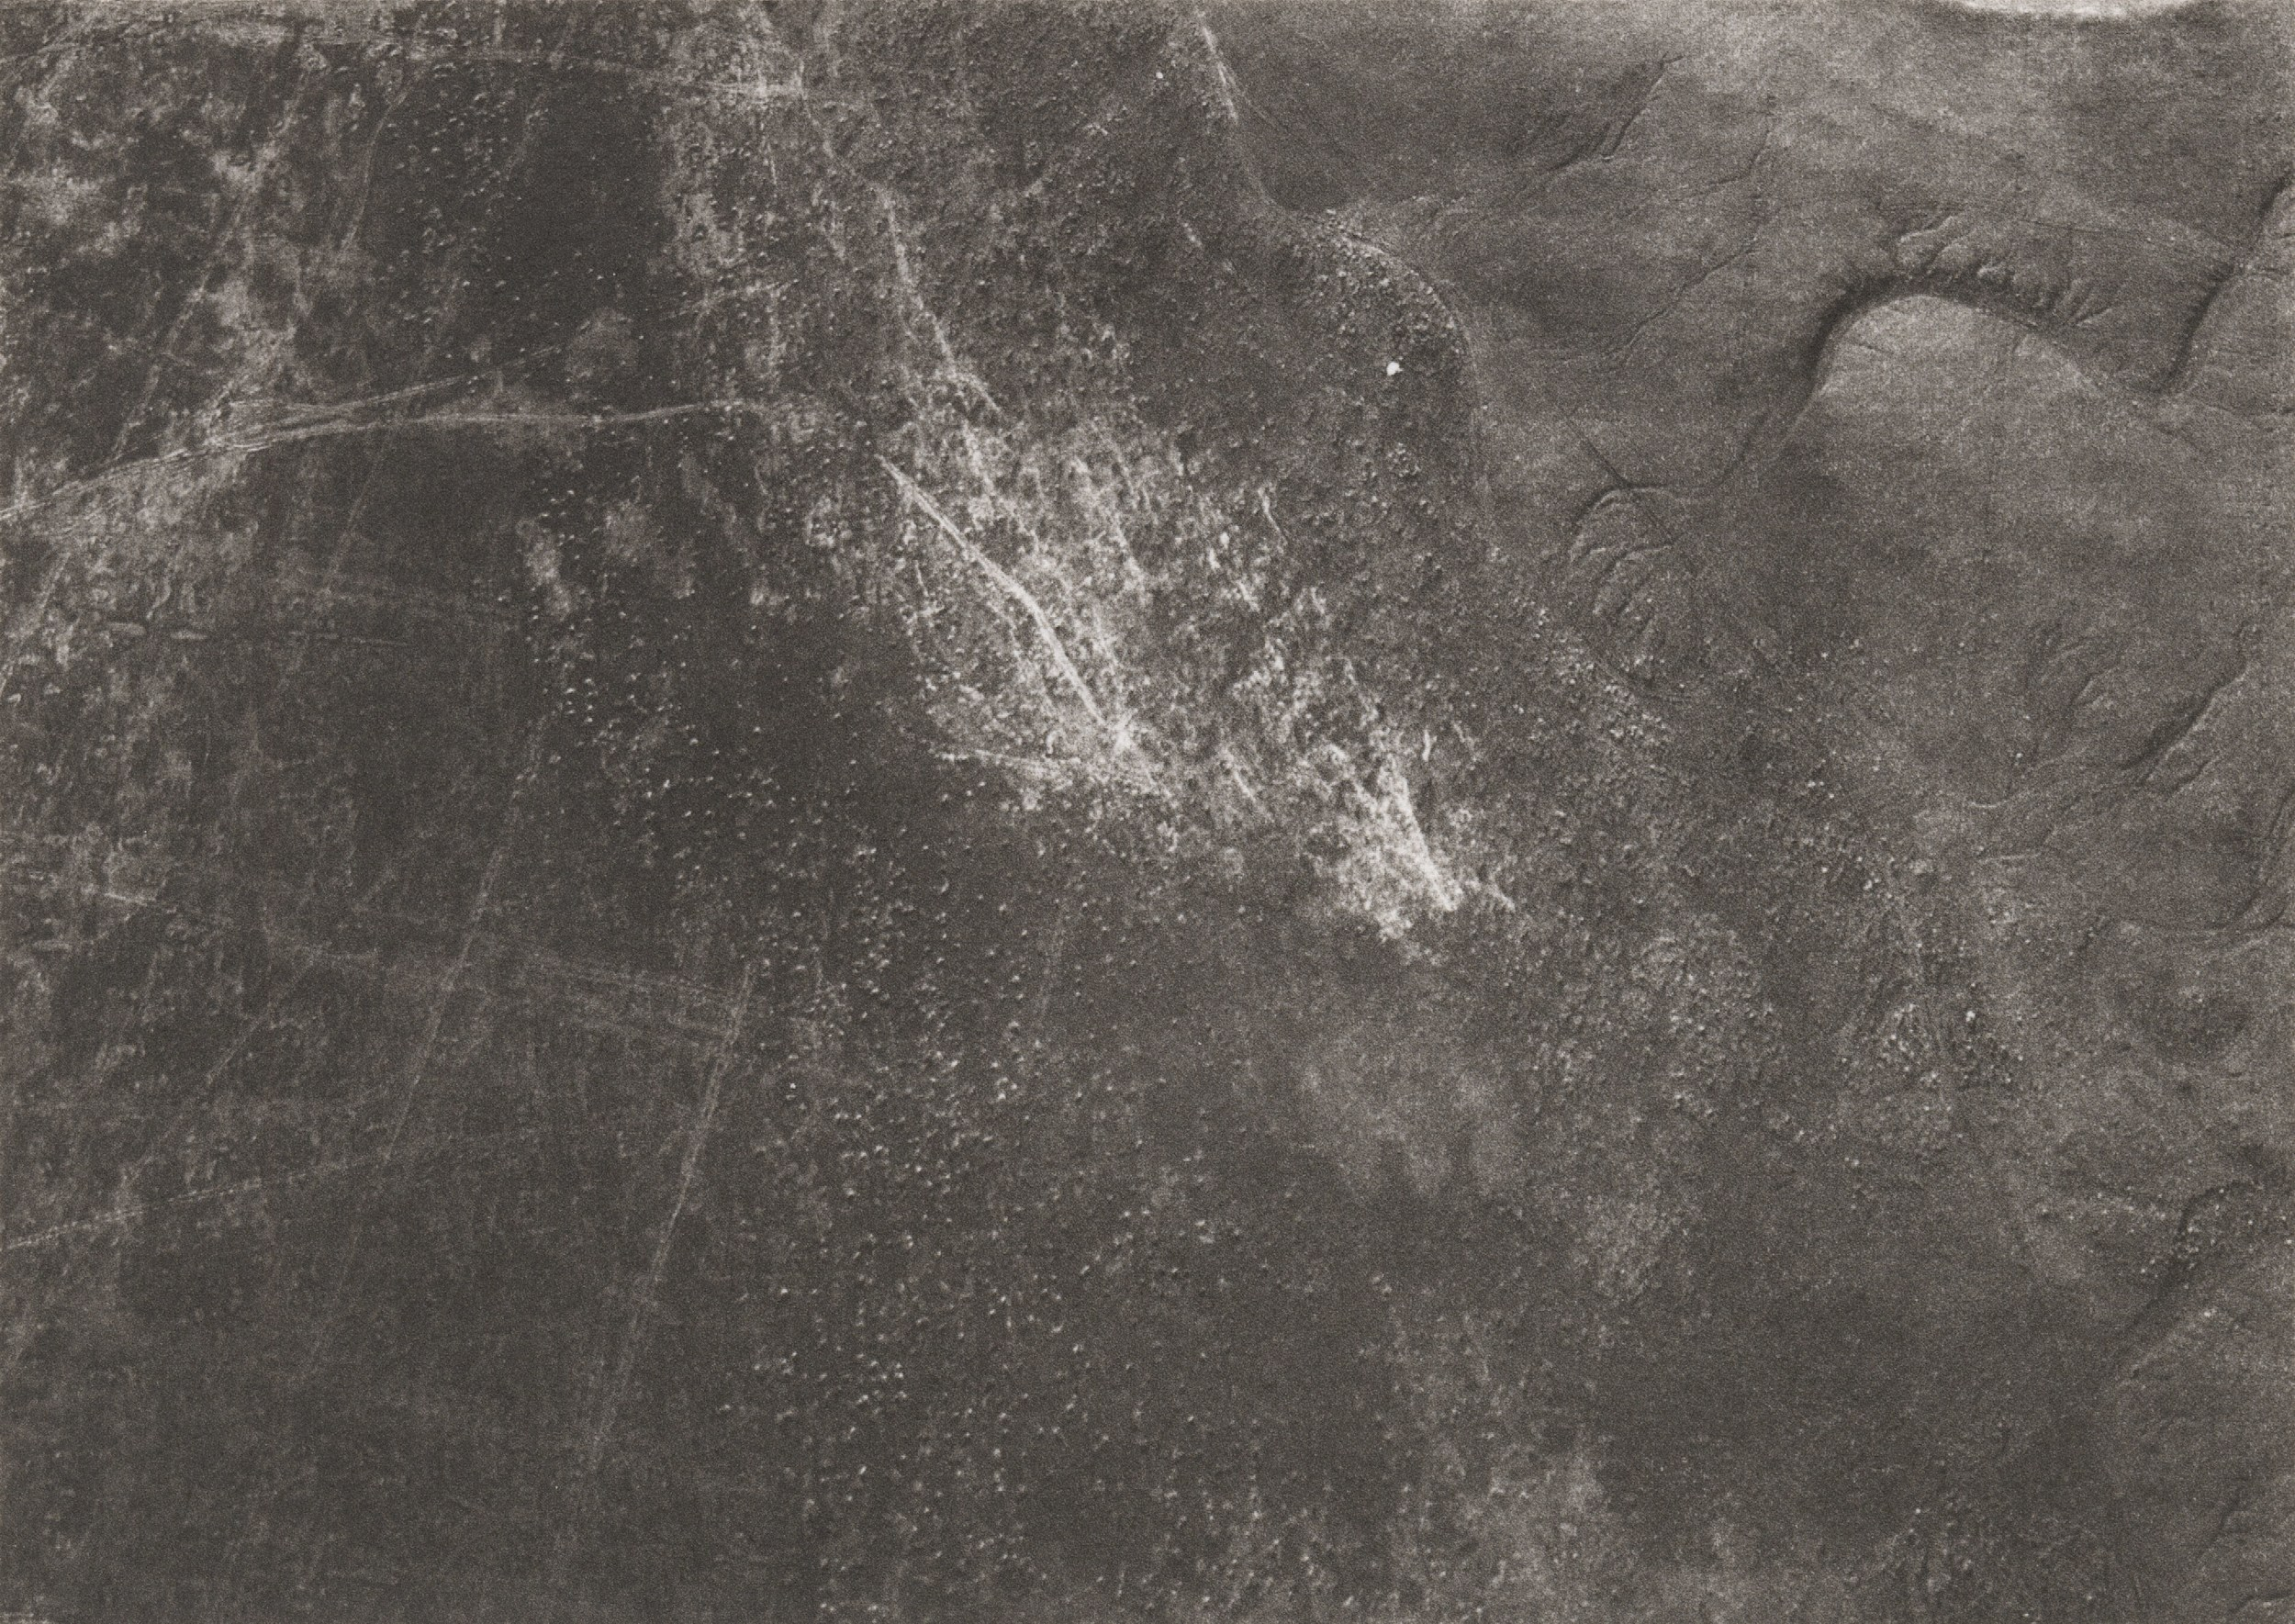 Satellite View II